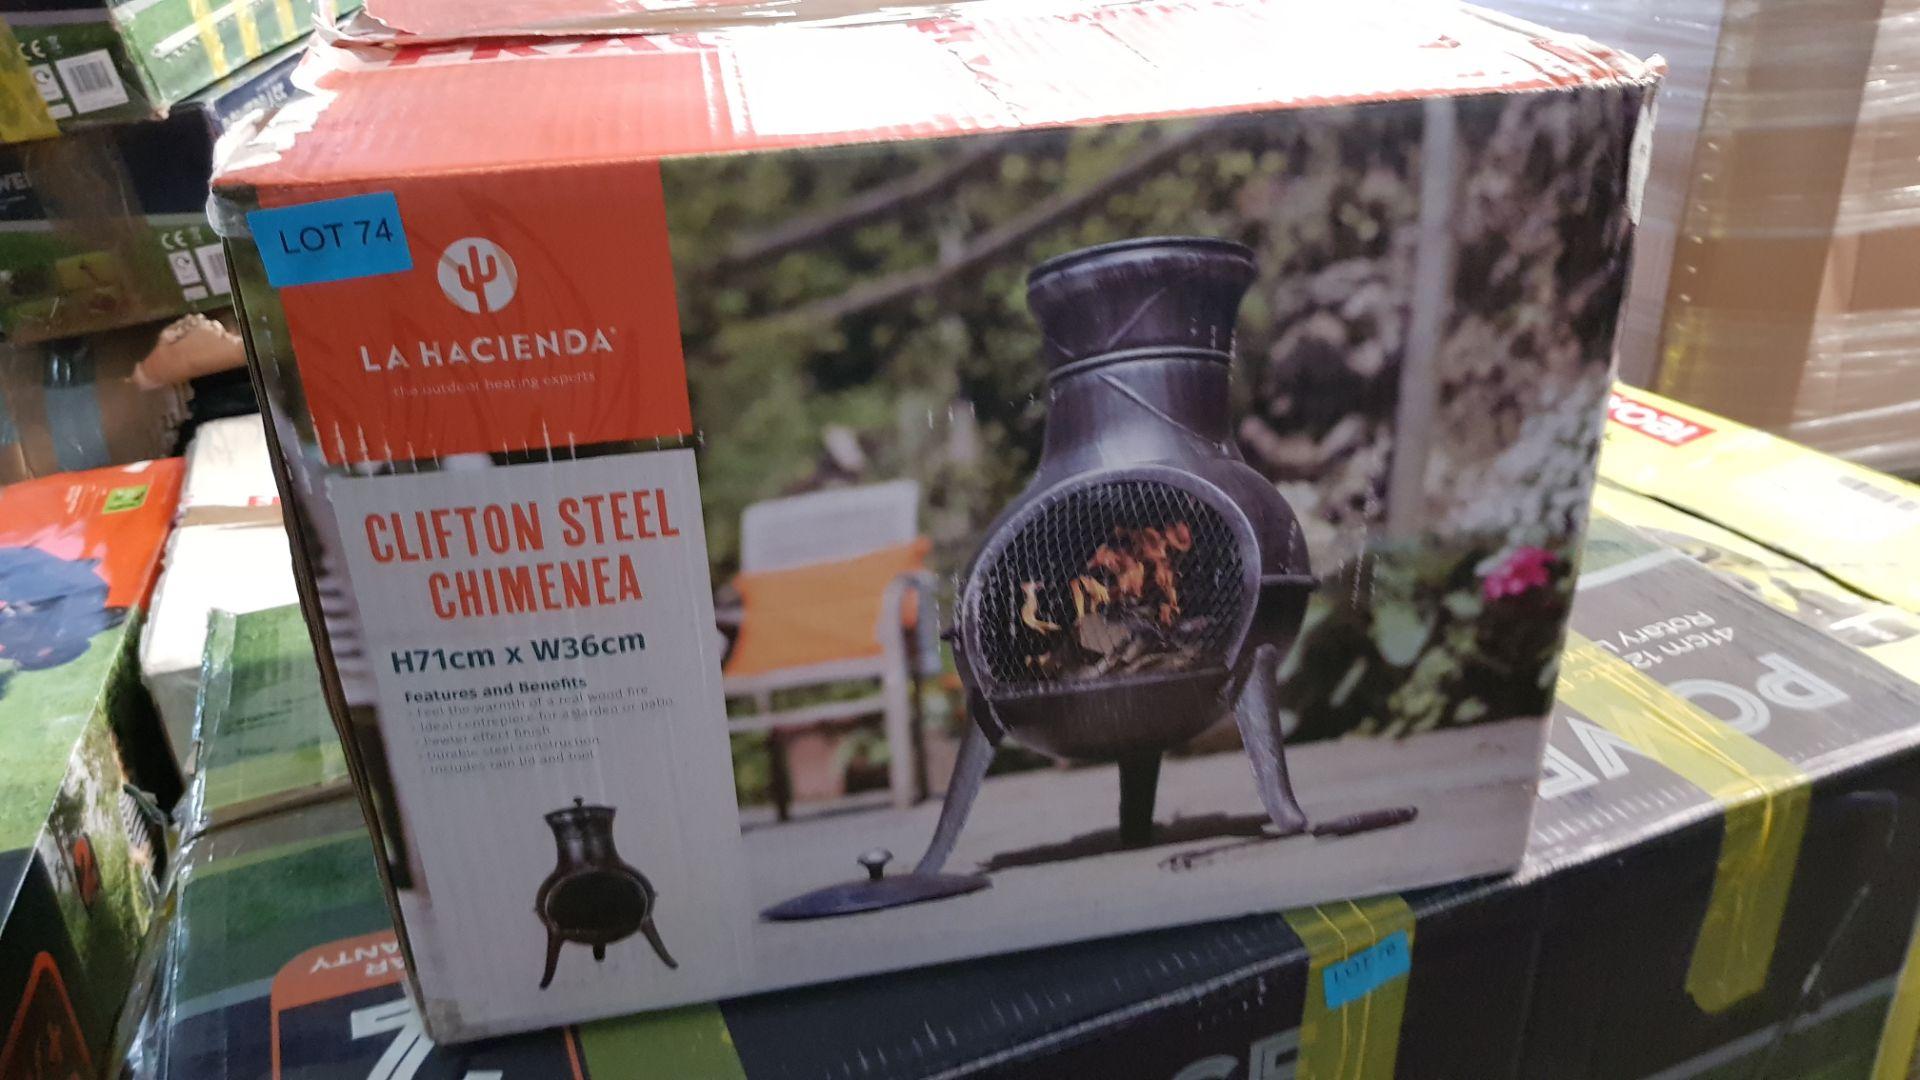 (P3) 1x La Hacienda Clifton Steel Chimenea. RRP £95.00. (H71x W36cm) - Image 3 of 3